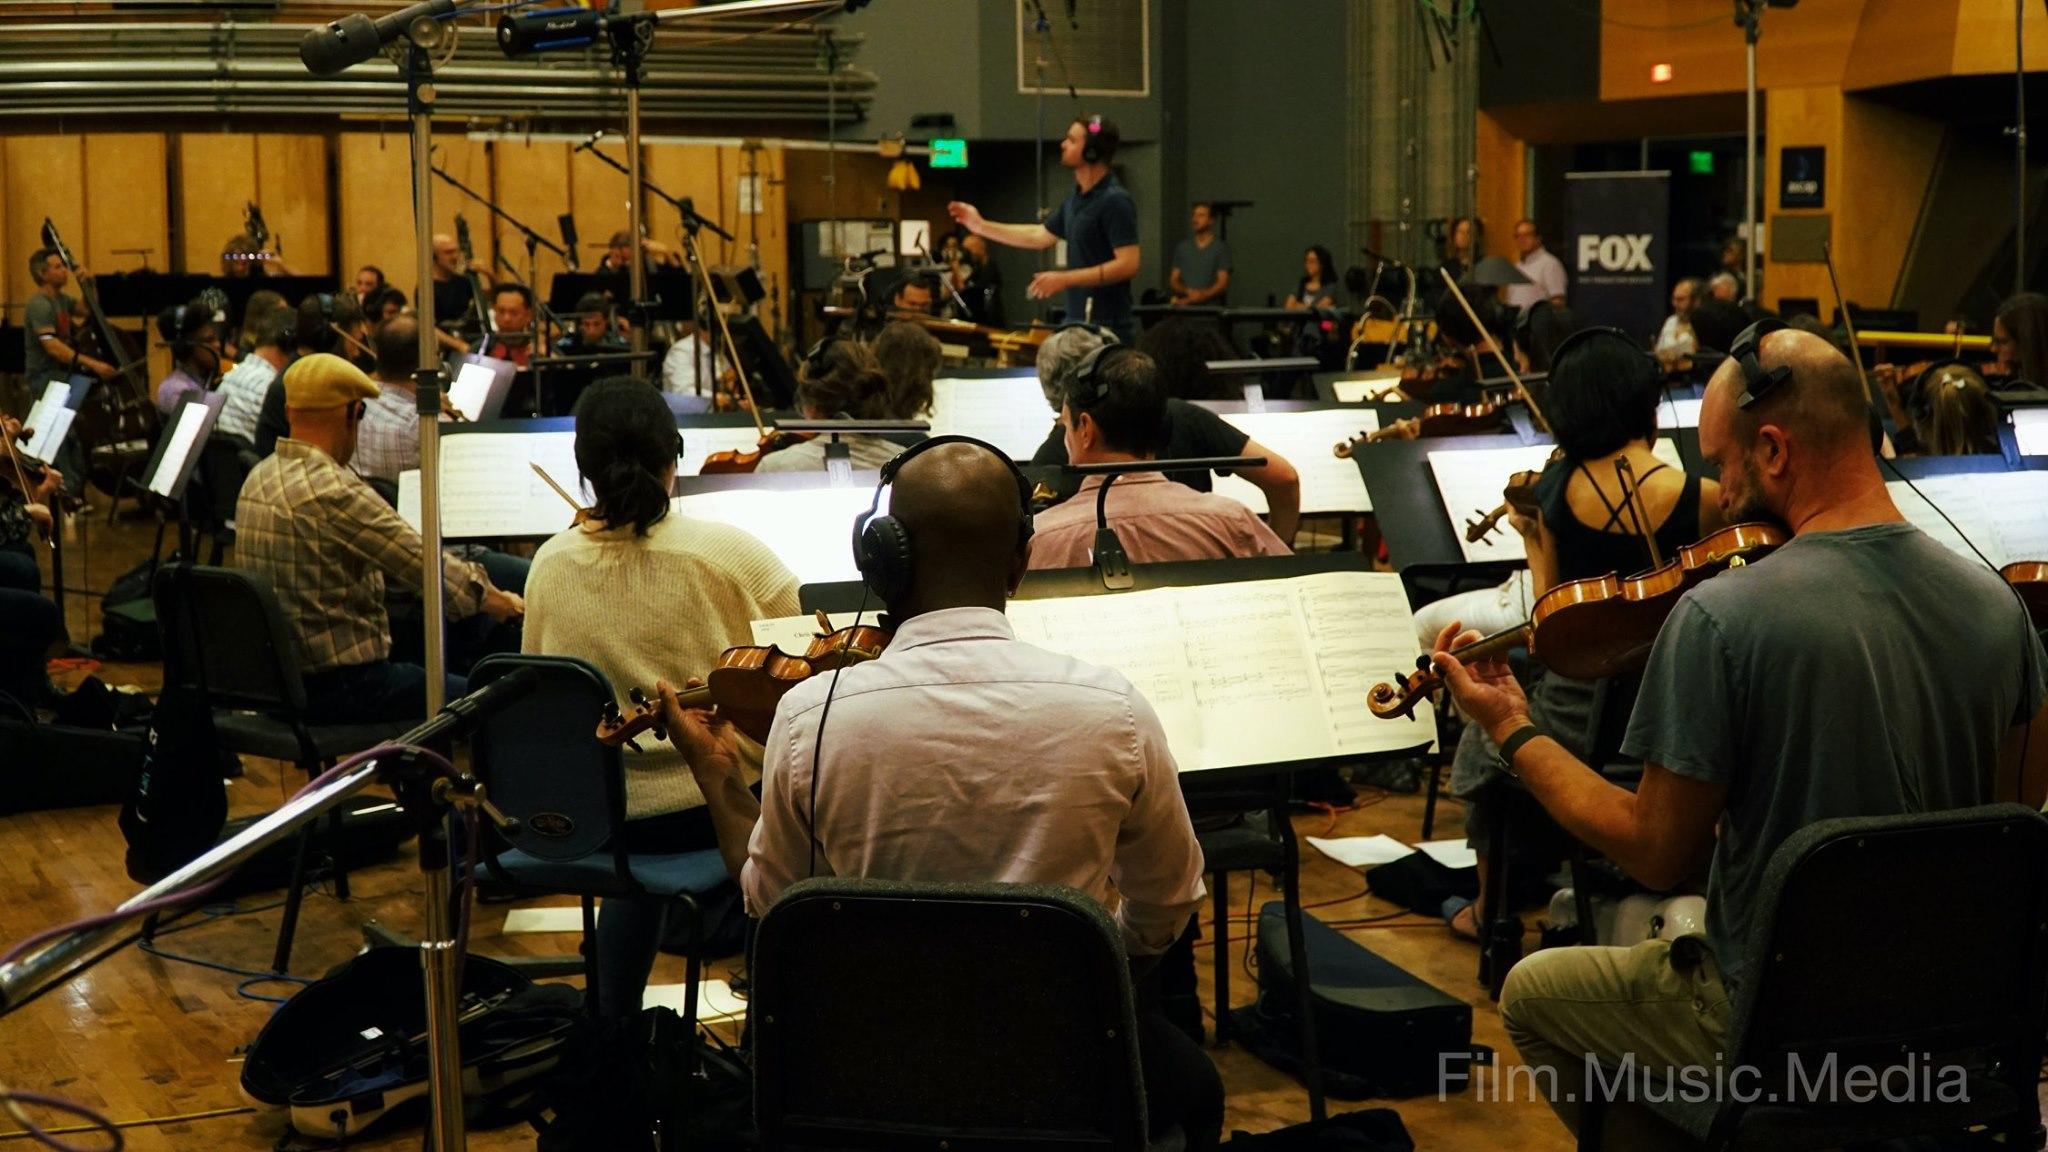 Film Music Media 4.jpg